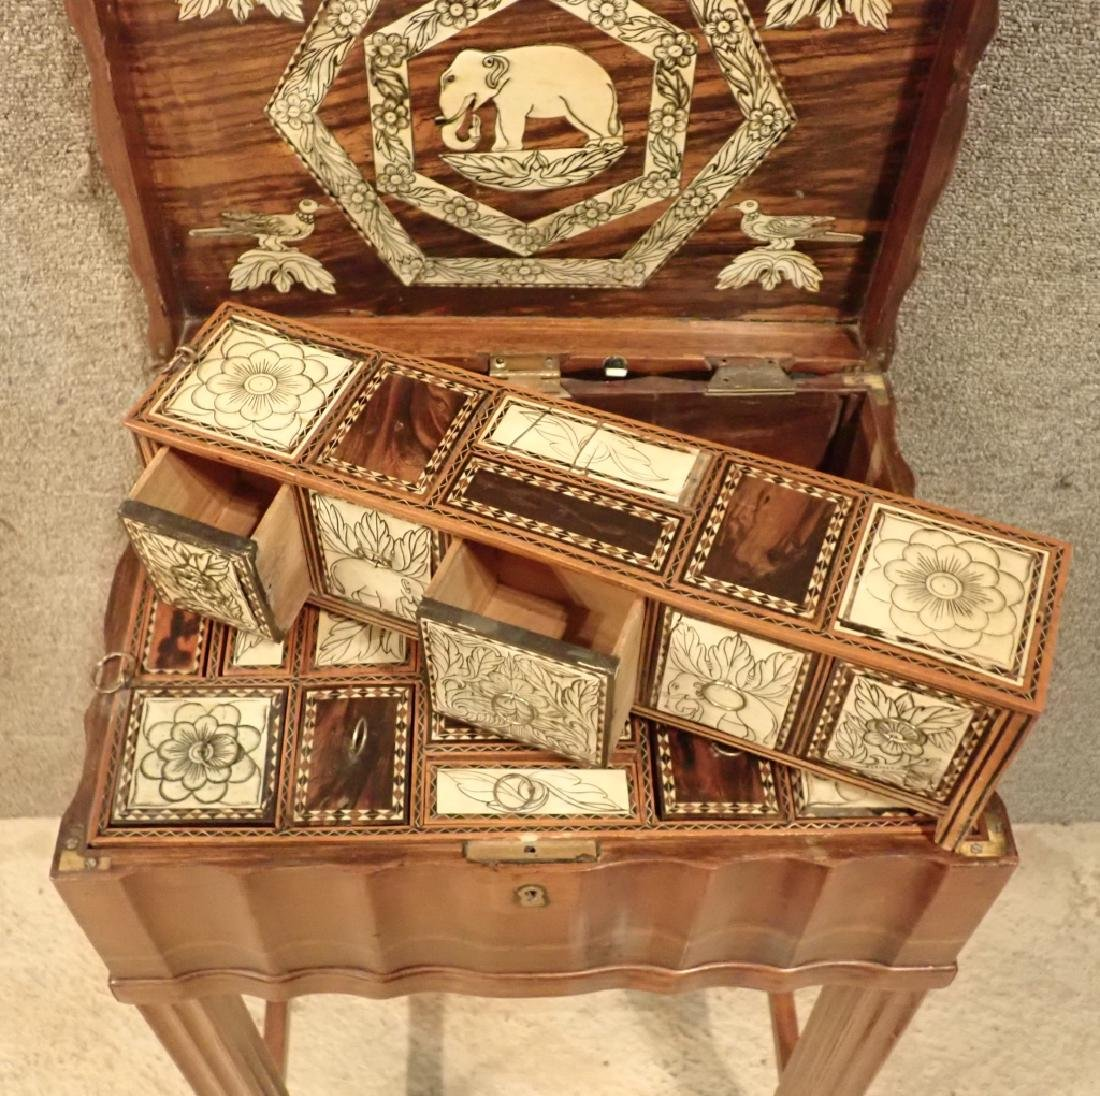 Anglo-Indian Zebra Wood Tea Box Table W Inlaid Drawers